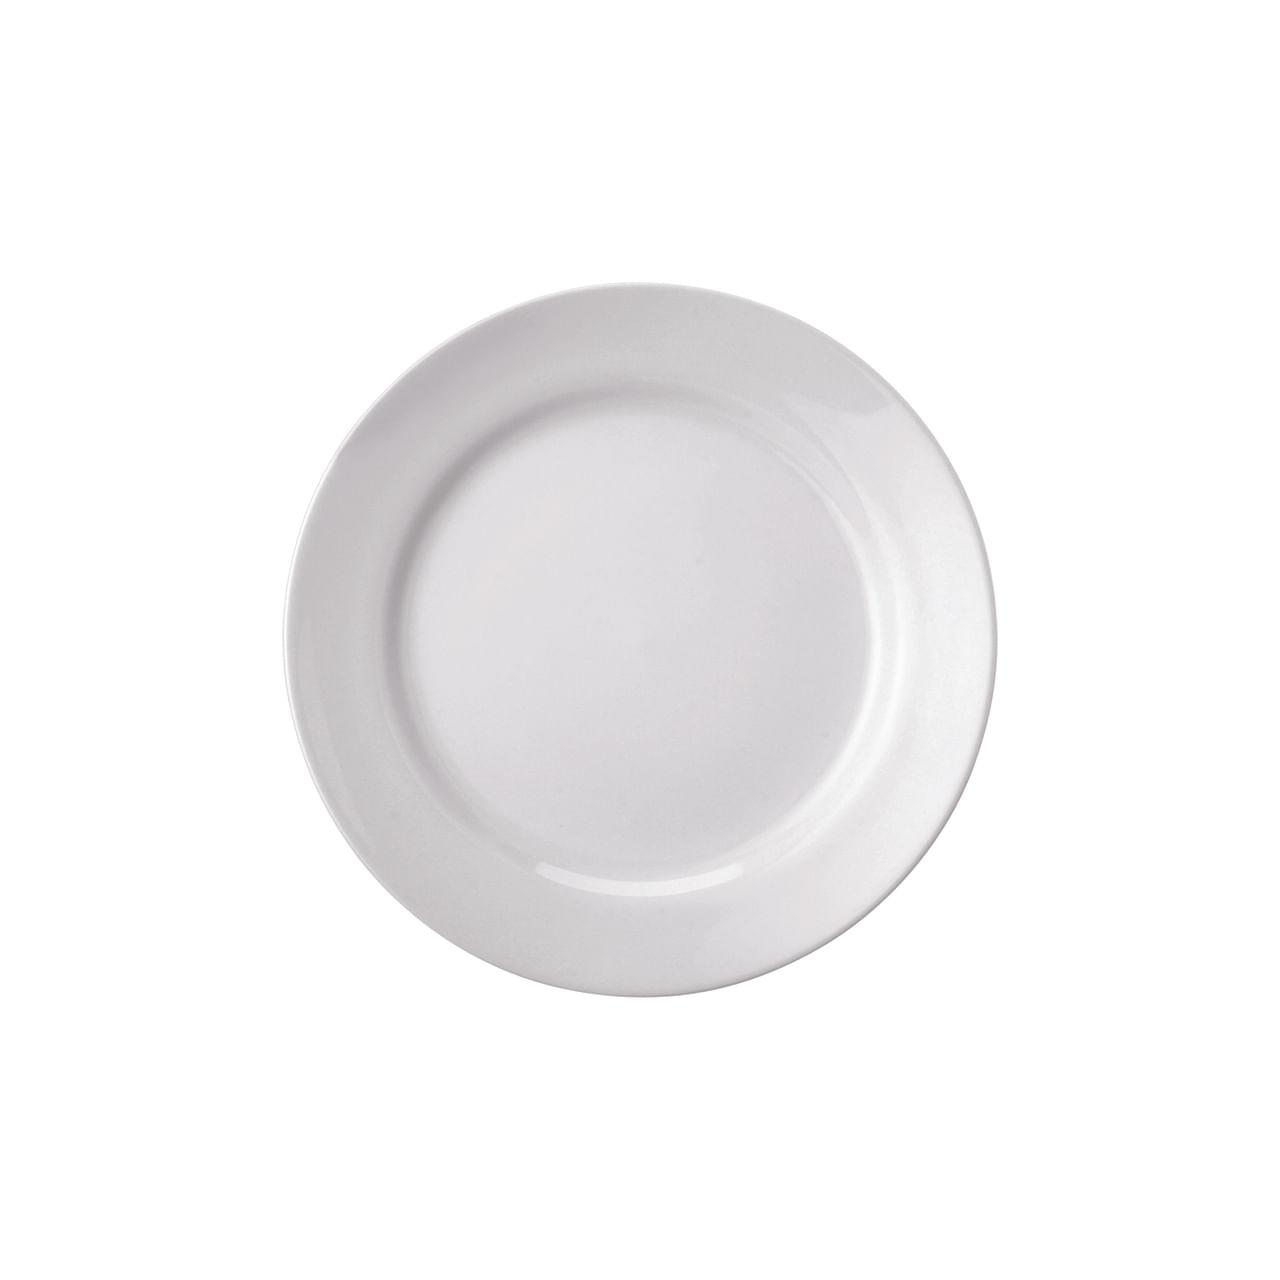 Prato Sobremesa 19Cm Branco Cilíndrico Schmdit